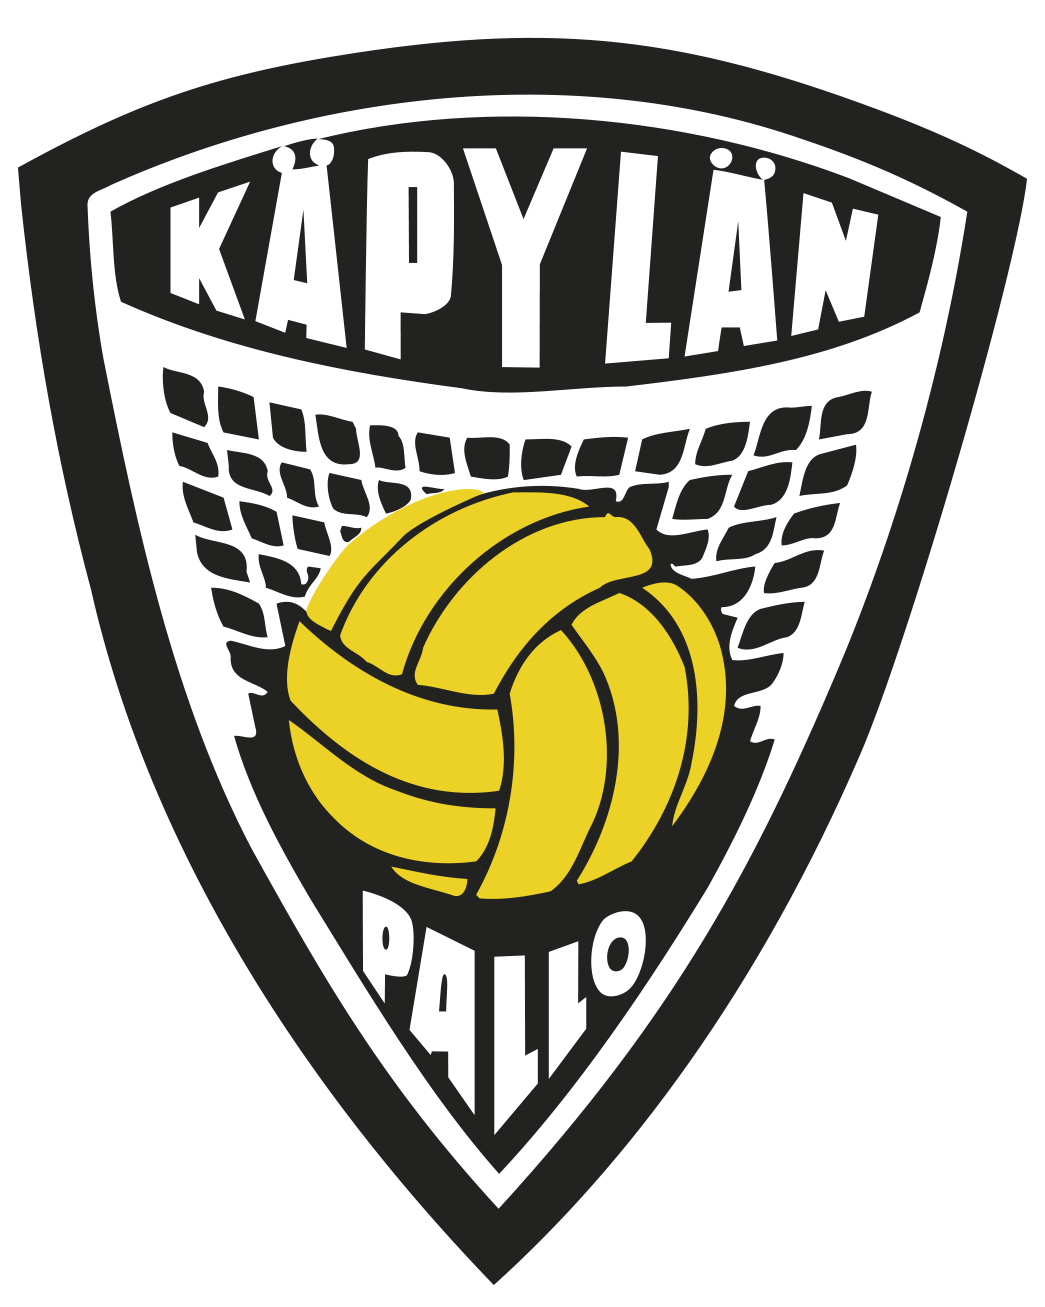 https://upload.wikimedia.org/wikipedia/fi/c/ca/K%C3%A4Pa_logo.png